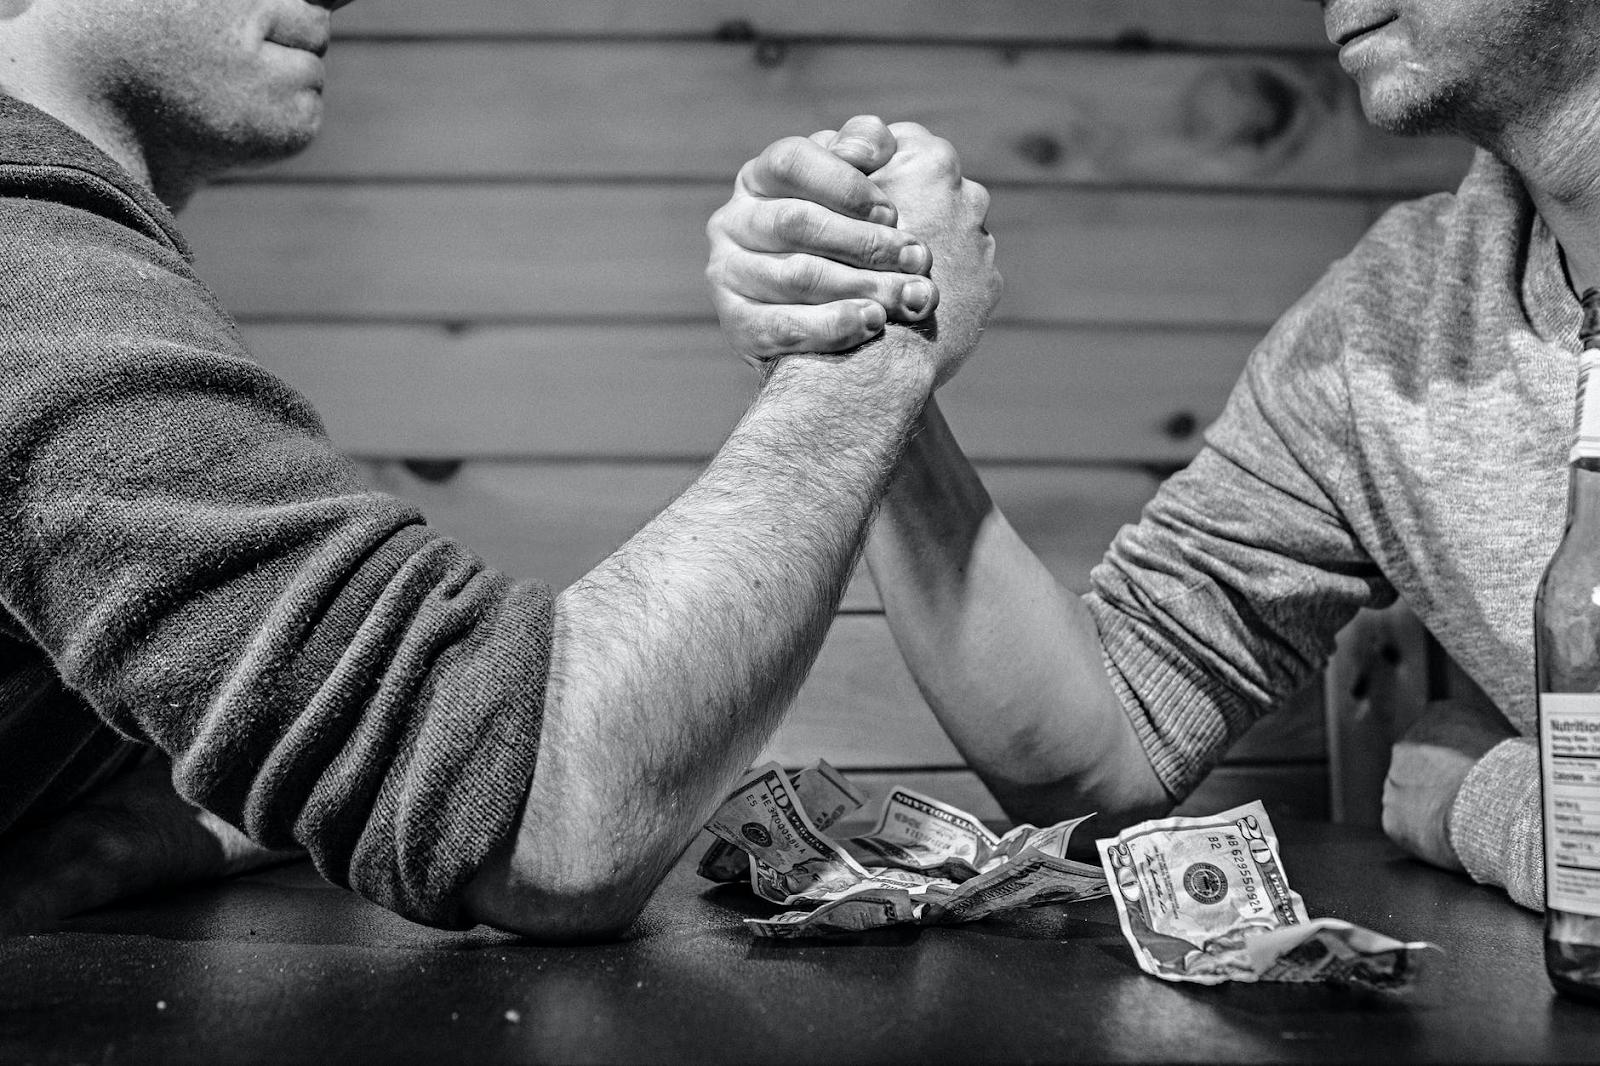 image showing two men hand wrestling